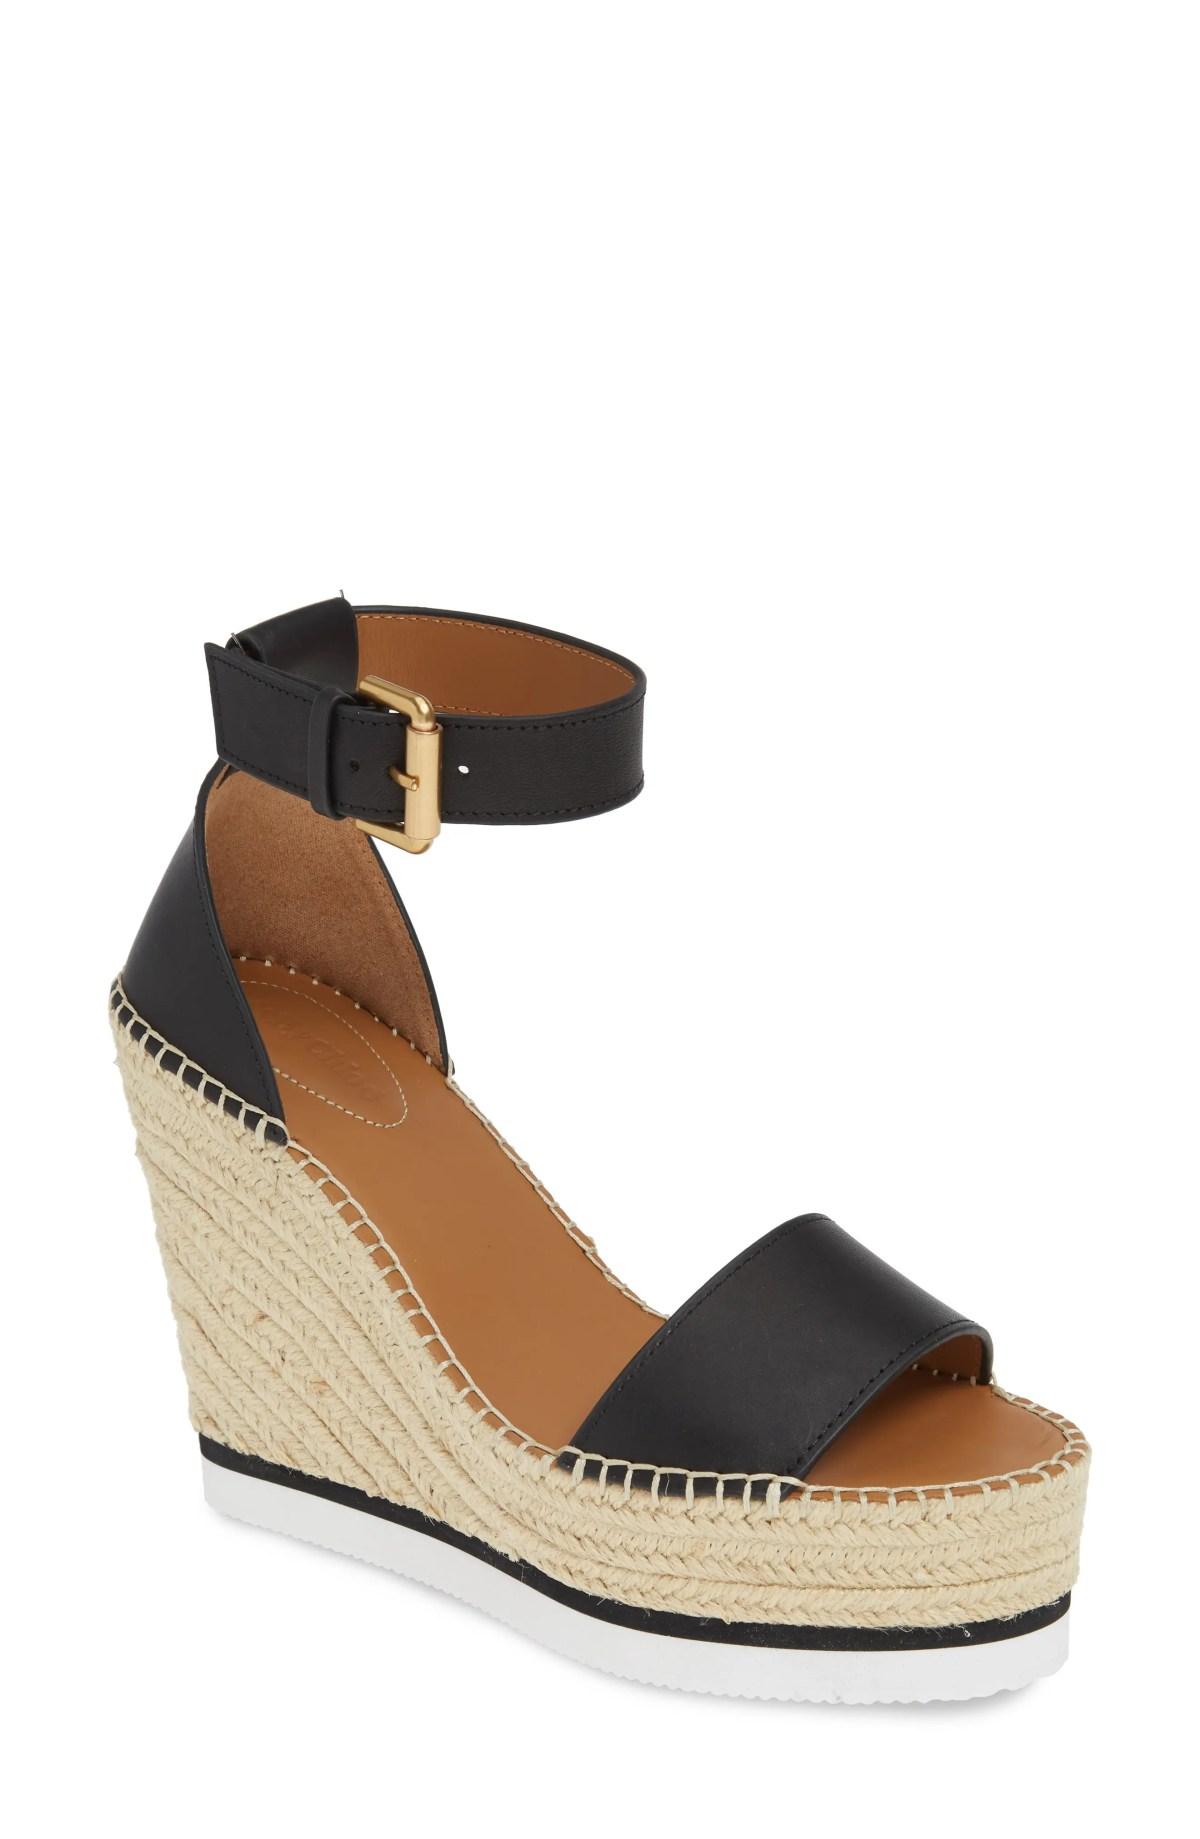 SEE BY CHLOÉ 'Glyn' Espadrille Wedge Sandal, Main, color, BLACK